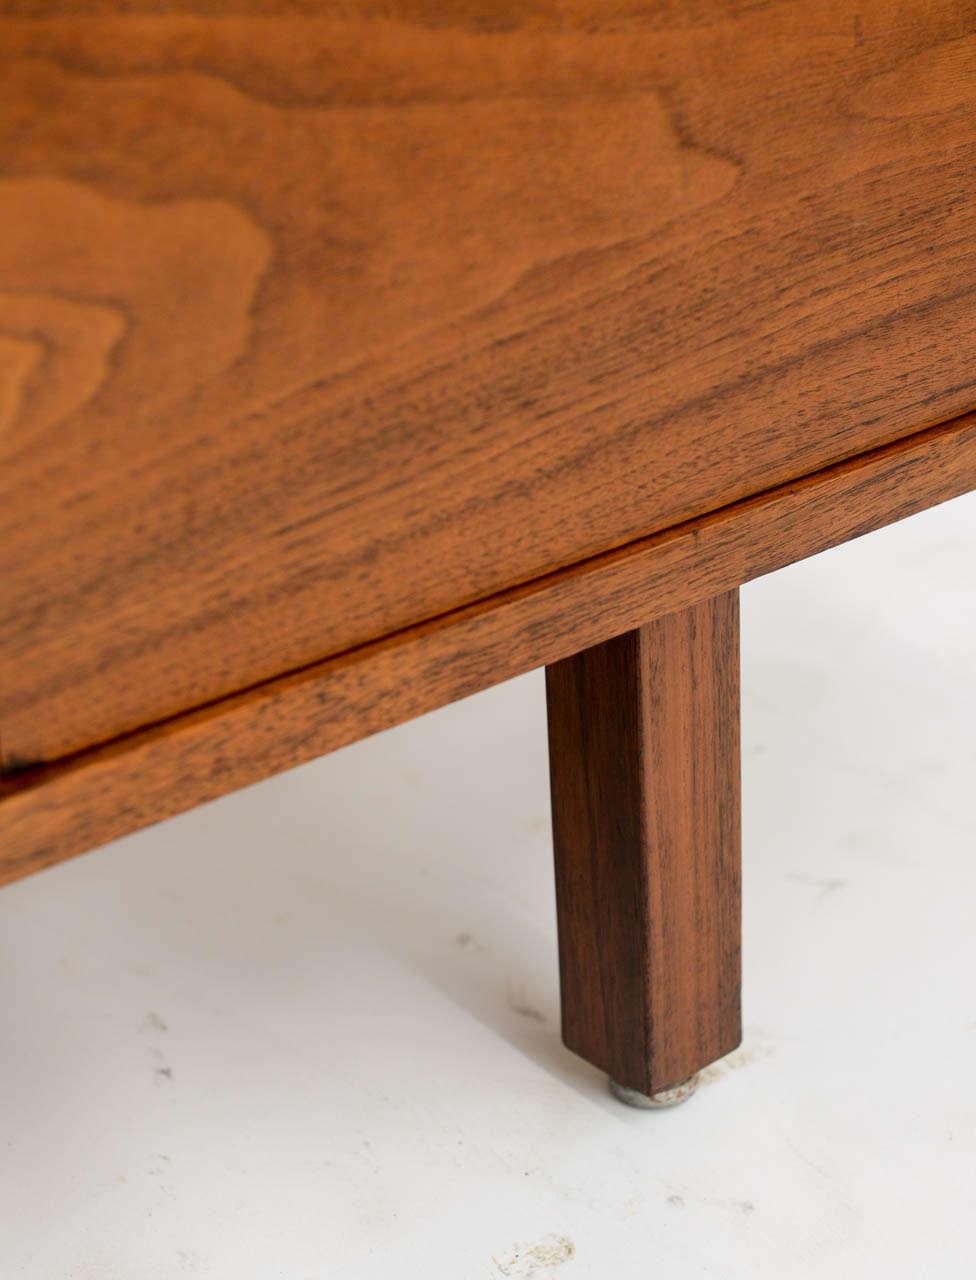 Smart Jens Risom Modern Walnut Long Four-Door Credenza Sideboard 1960s For Sale 2